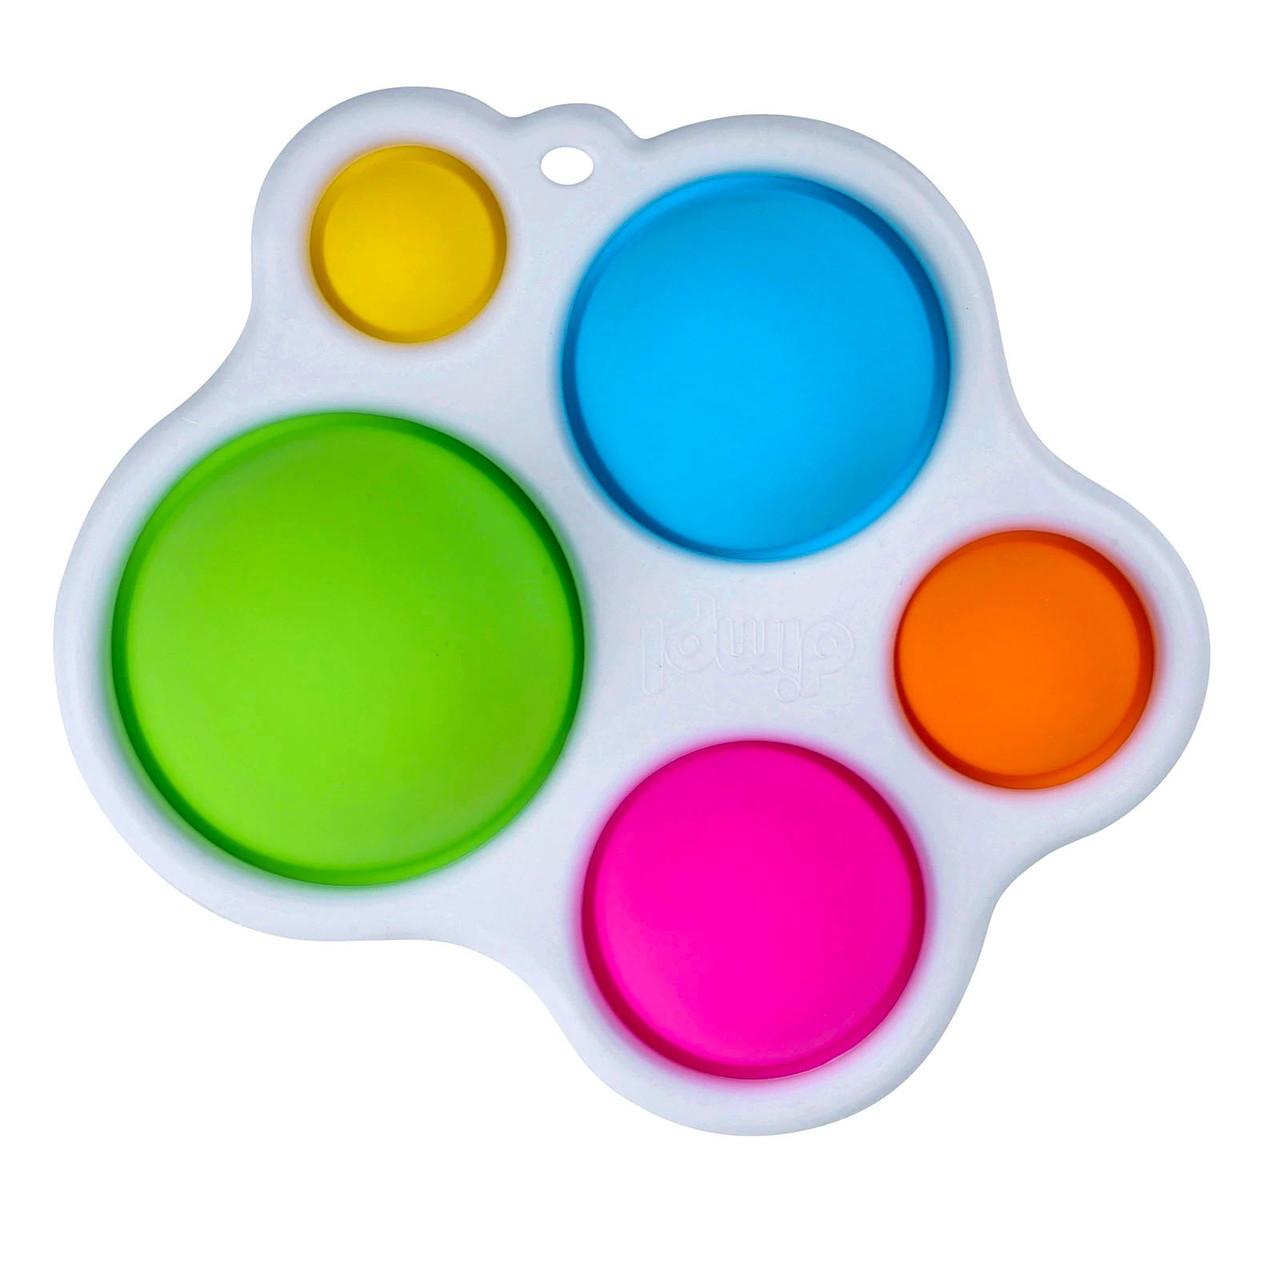 Сенсорная игрушка Simple Dimple поп ит антистресс симпл димпл pop it палитра 5